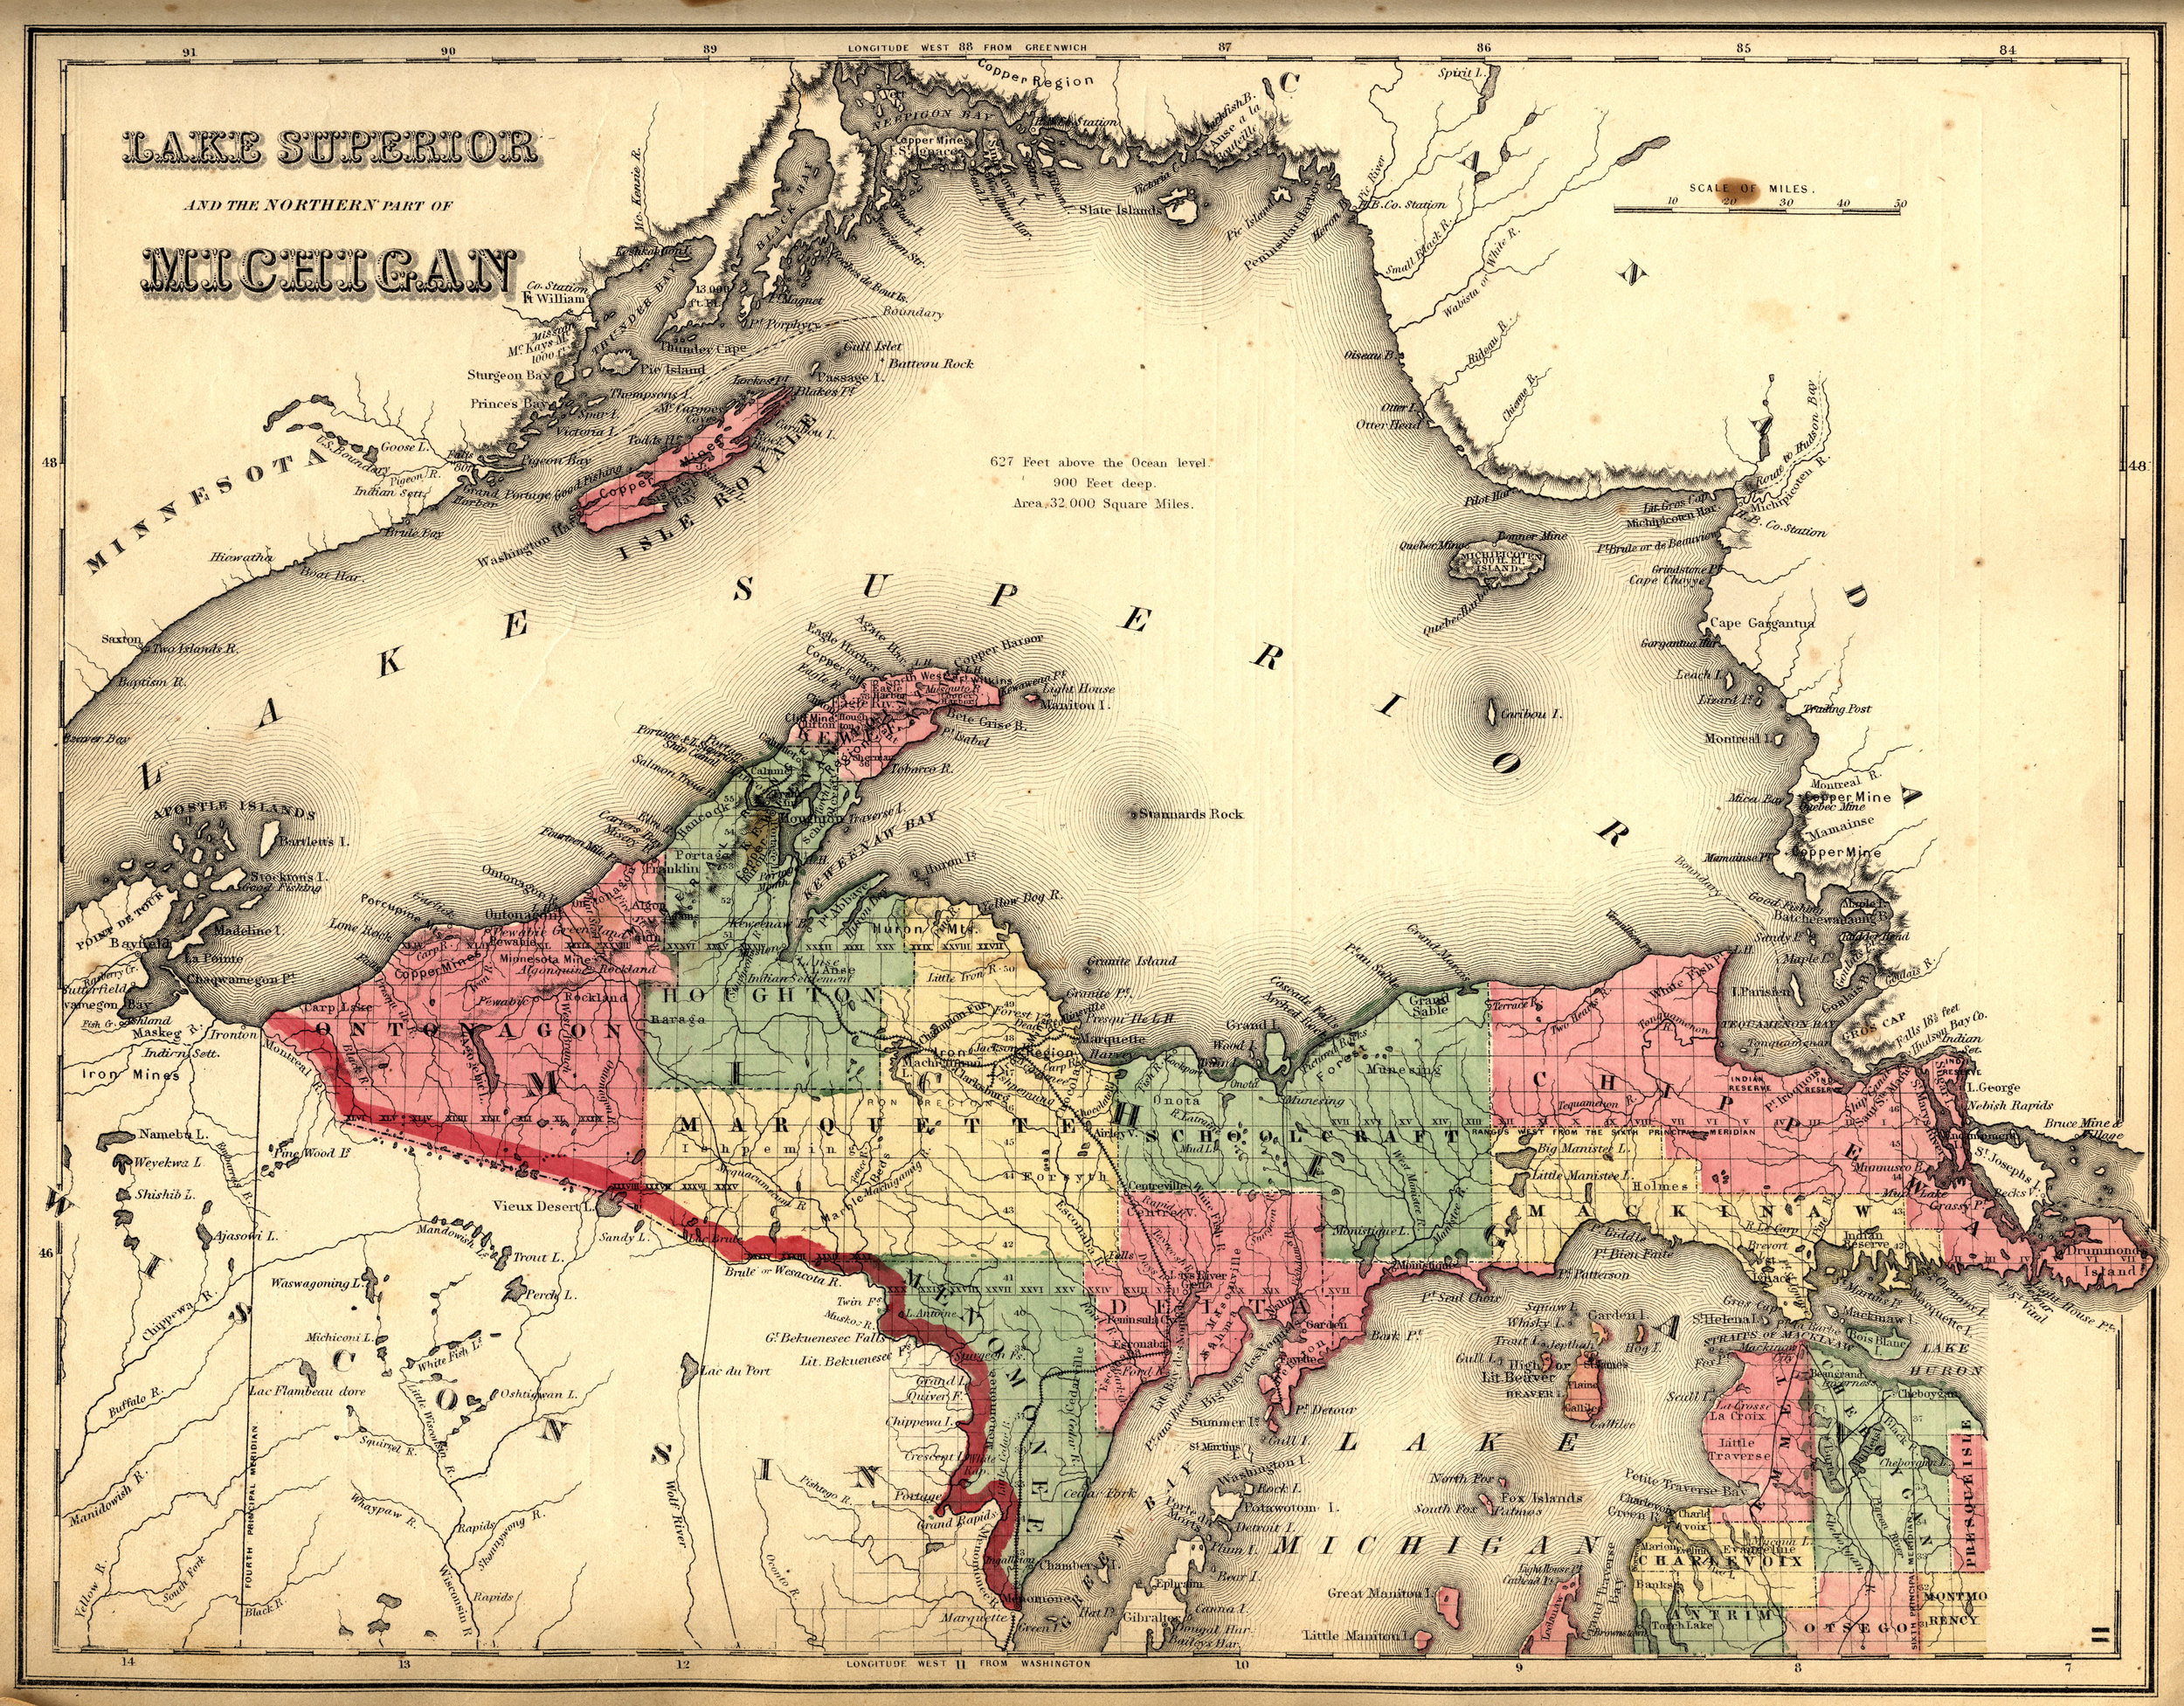 1873, Michigan, Upper Peninsula ( photo credit )